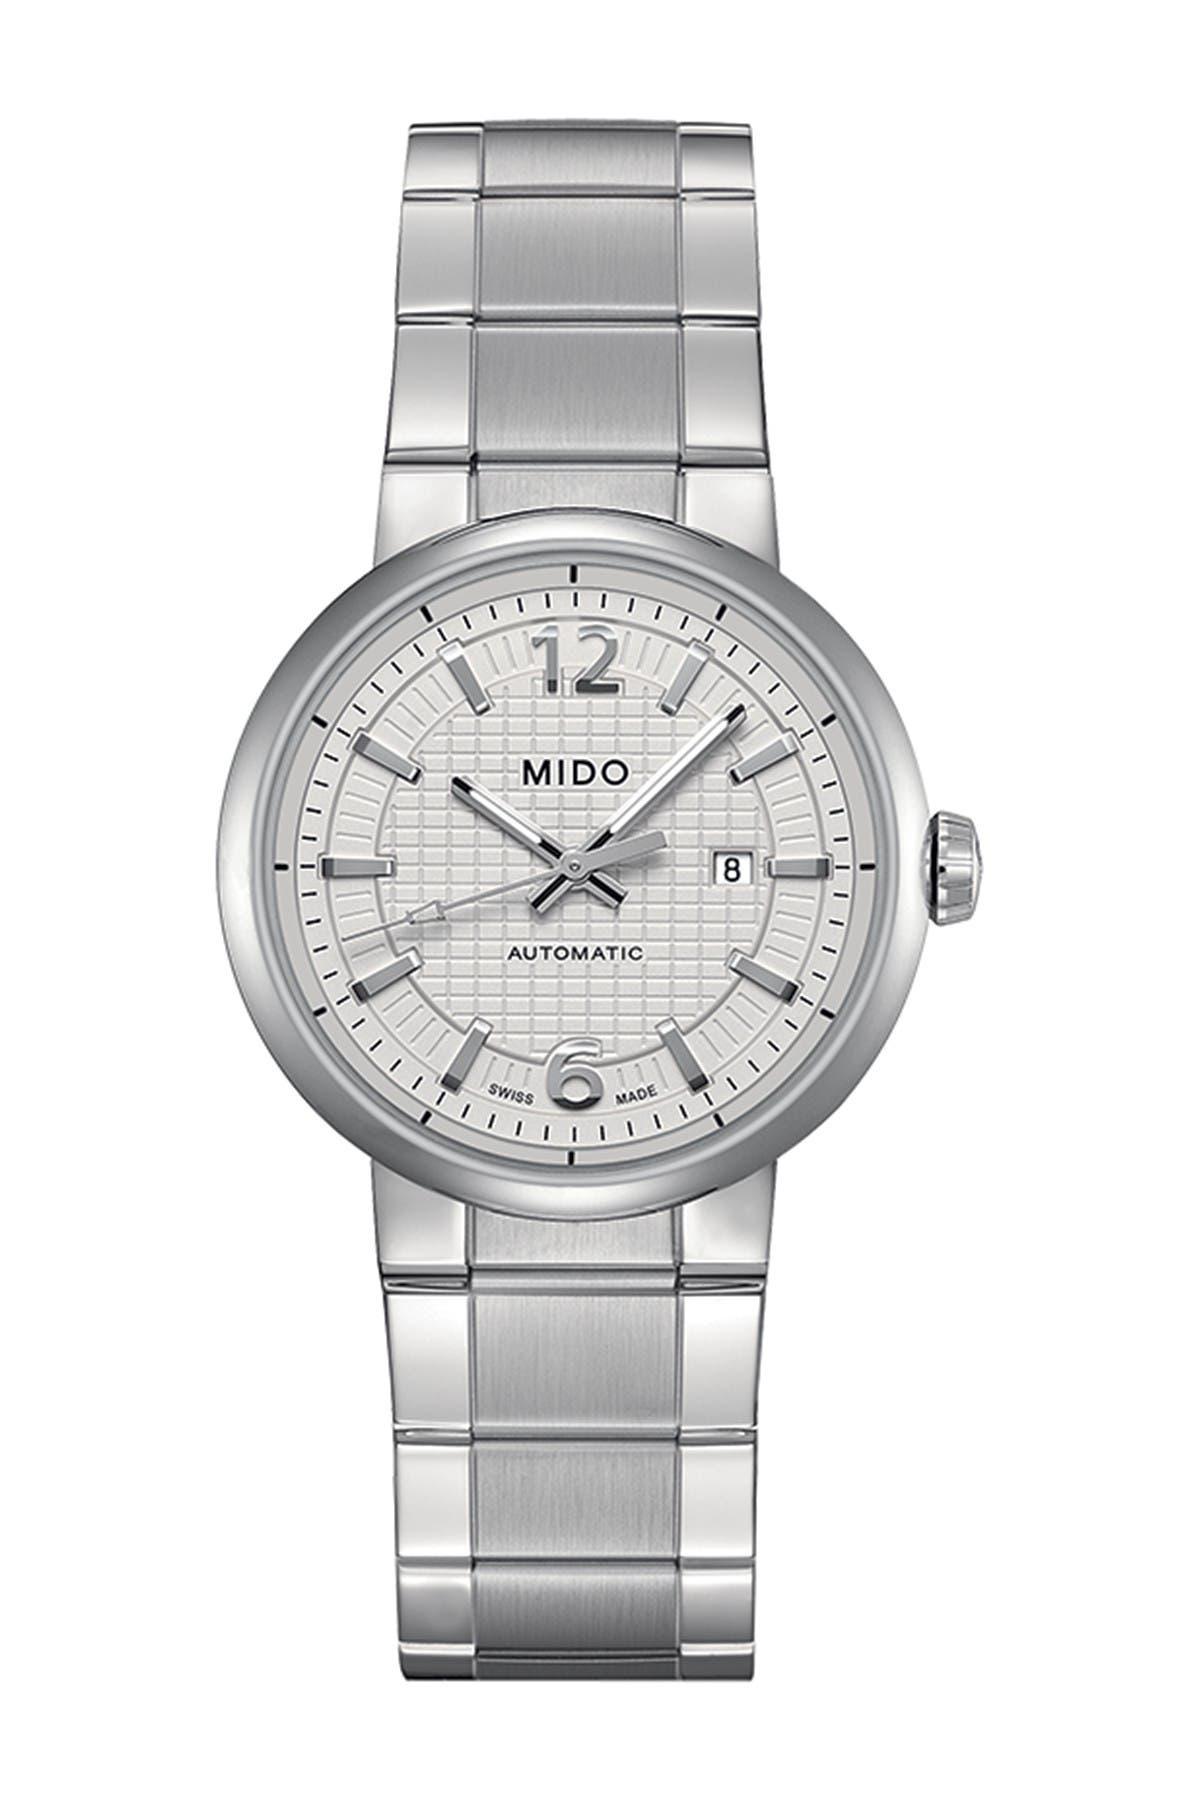 Image of MIDO Women's Great Wall Automatic Bracelet Watch, 31mm